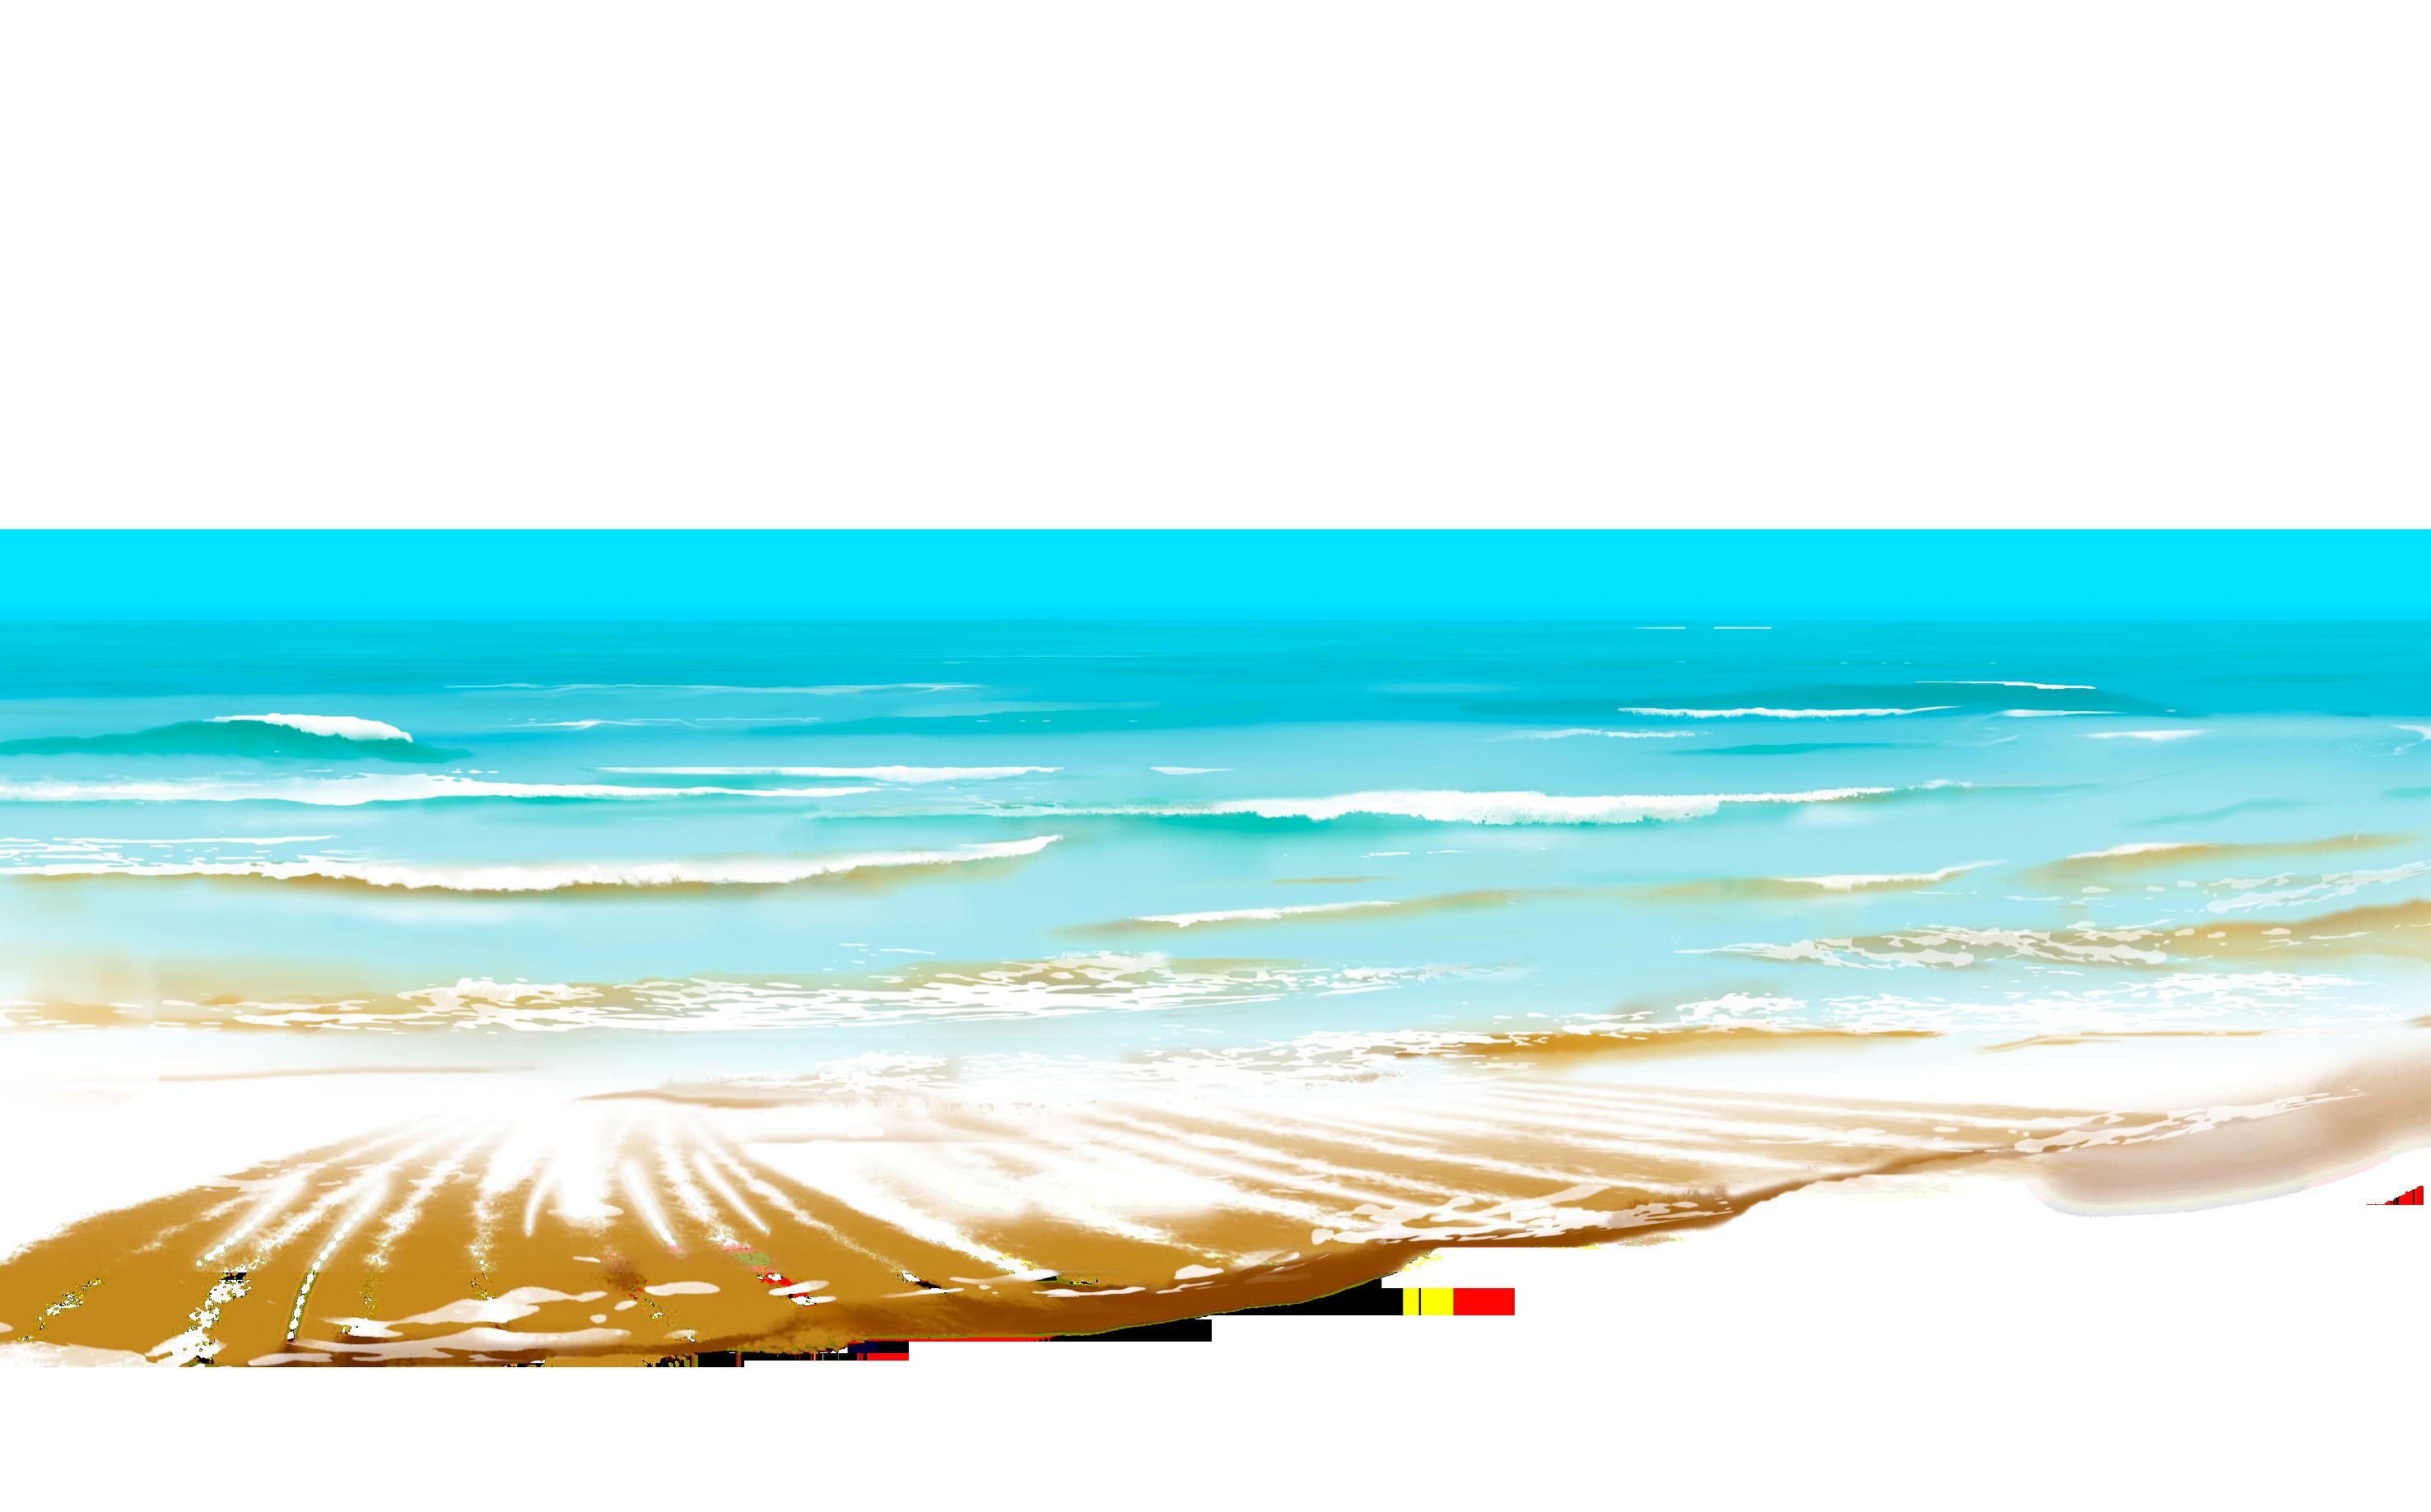 Ocean clipart blue ocean. Shore beach wave pencil